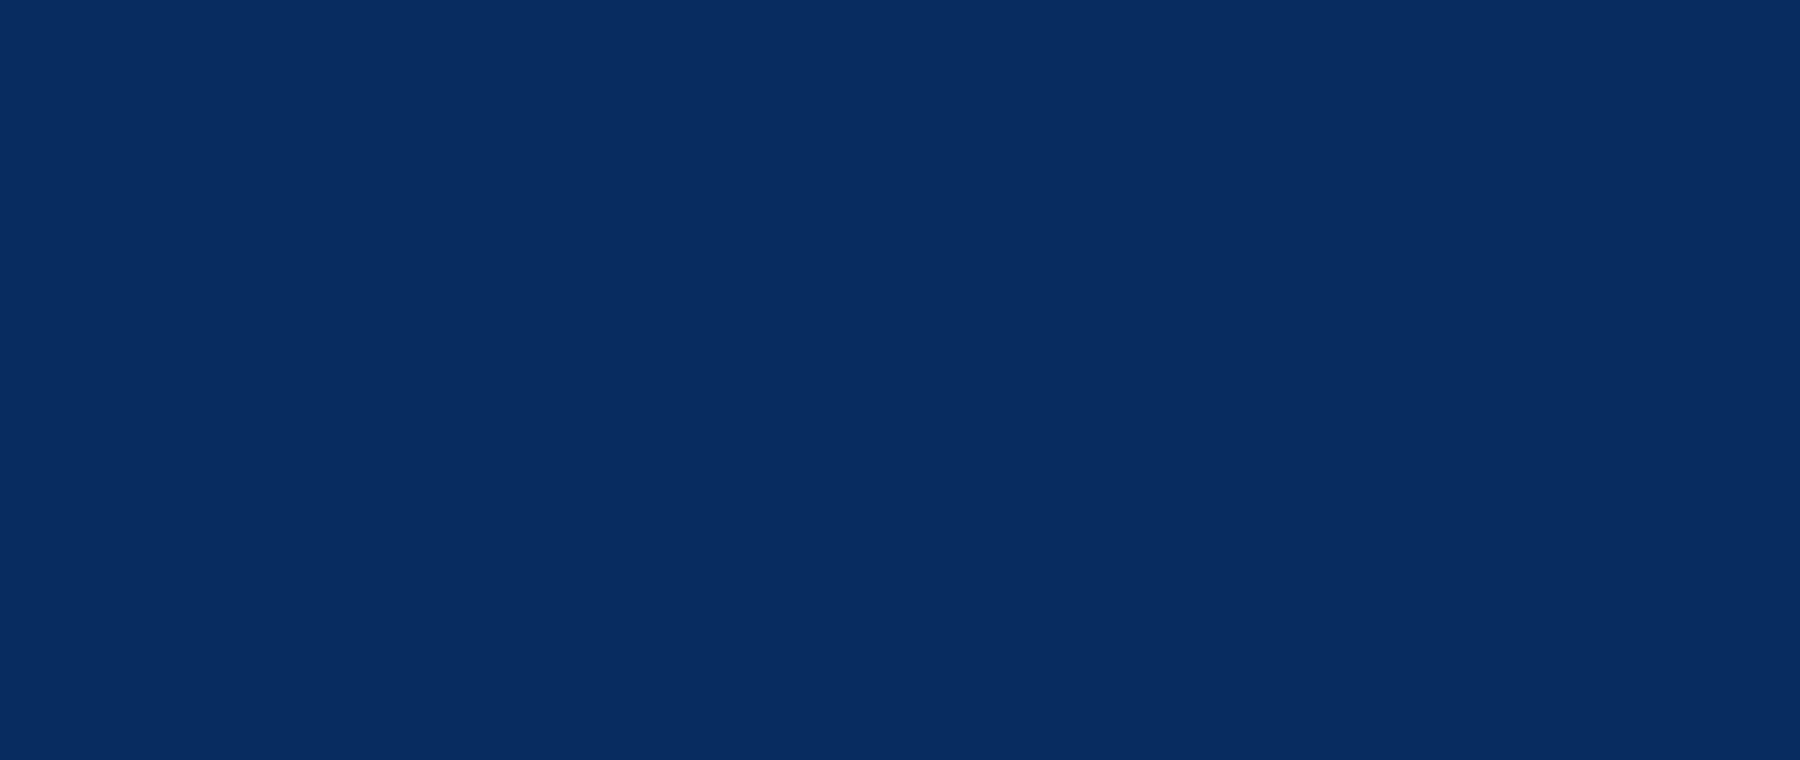 Hyundai Blue Background